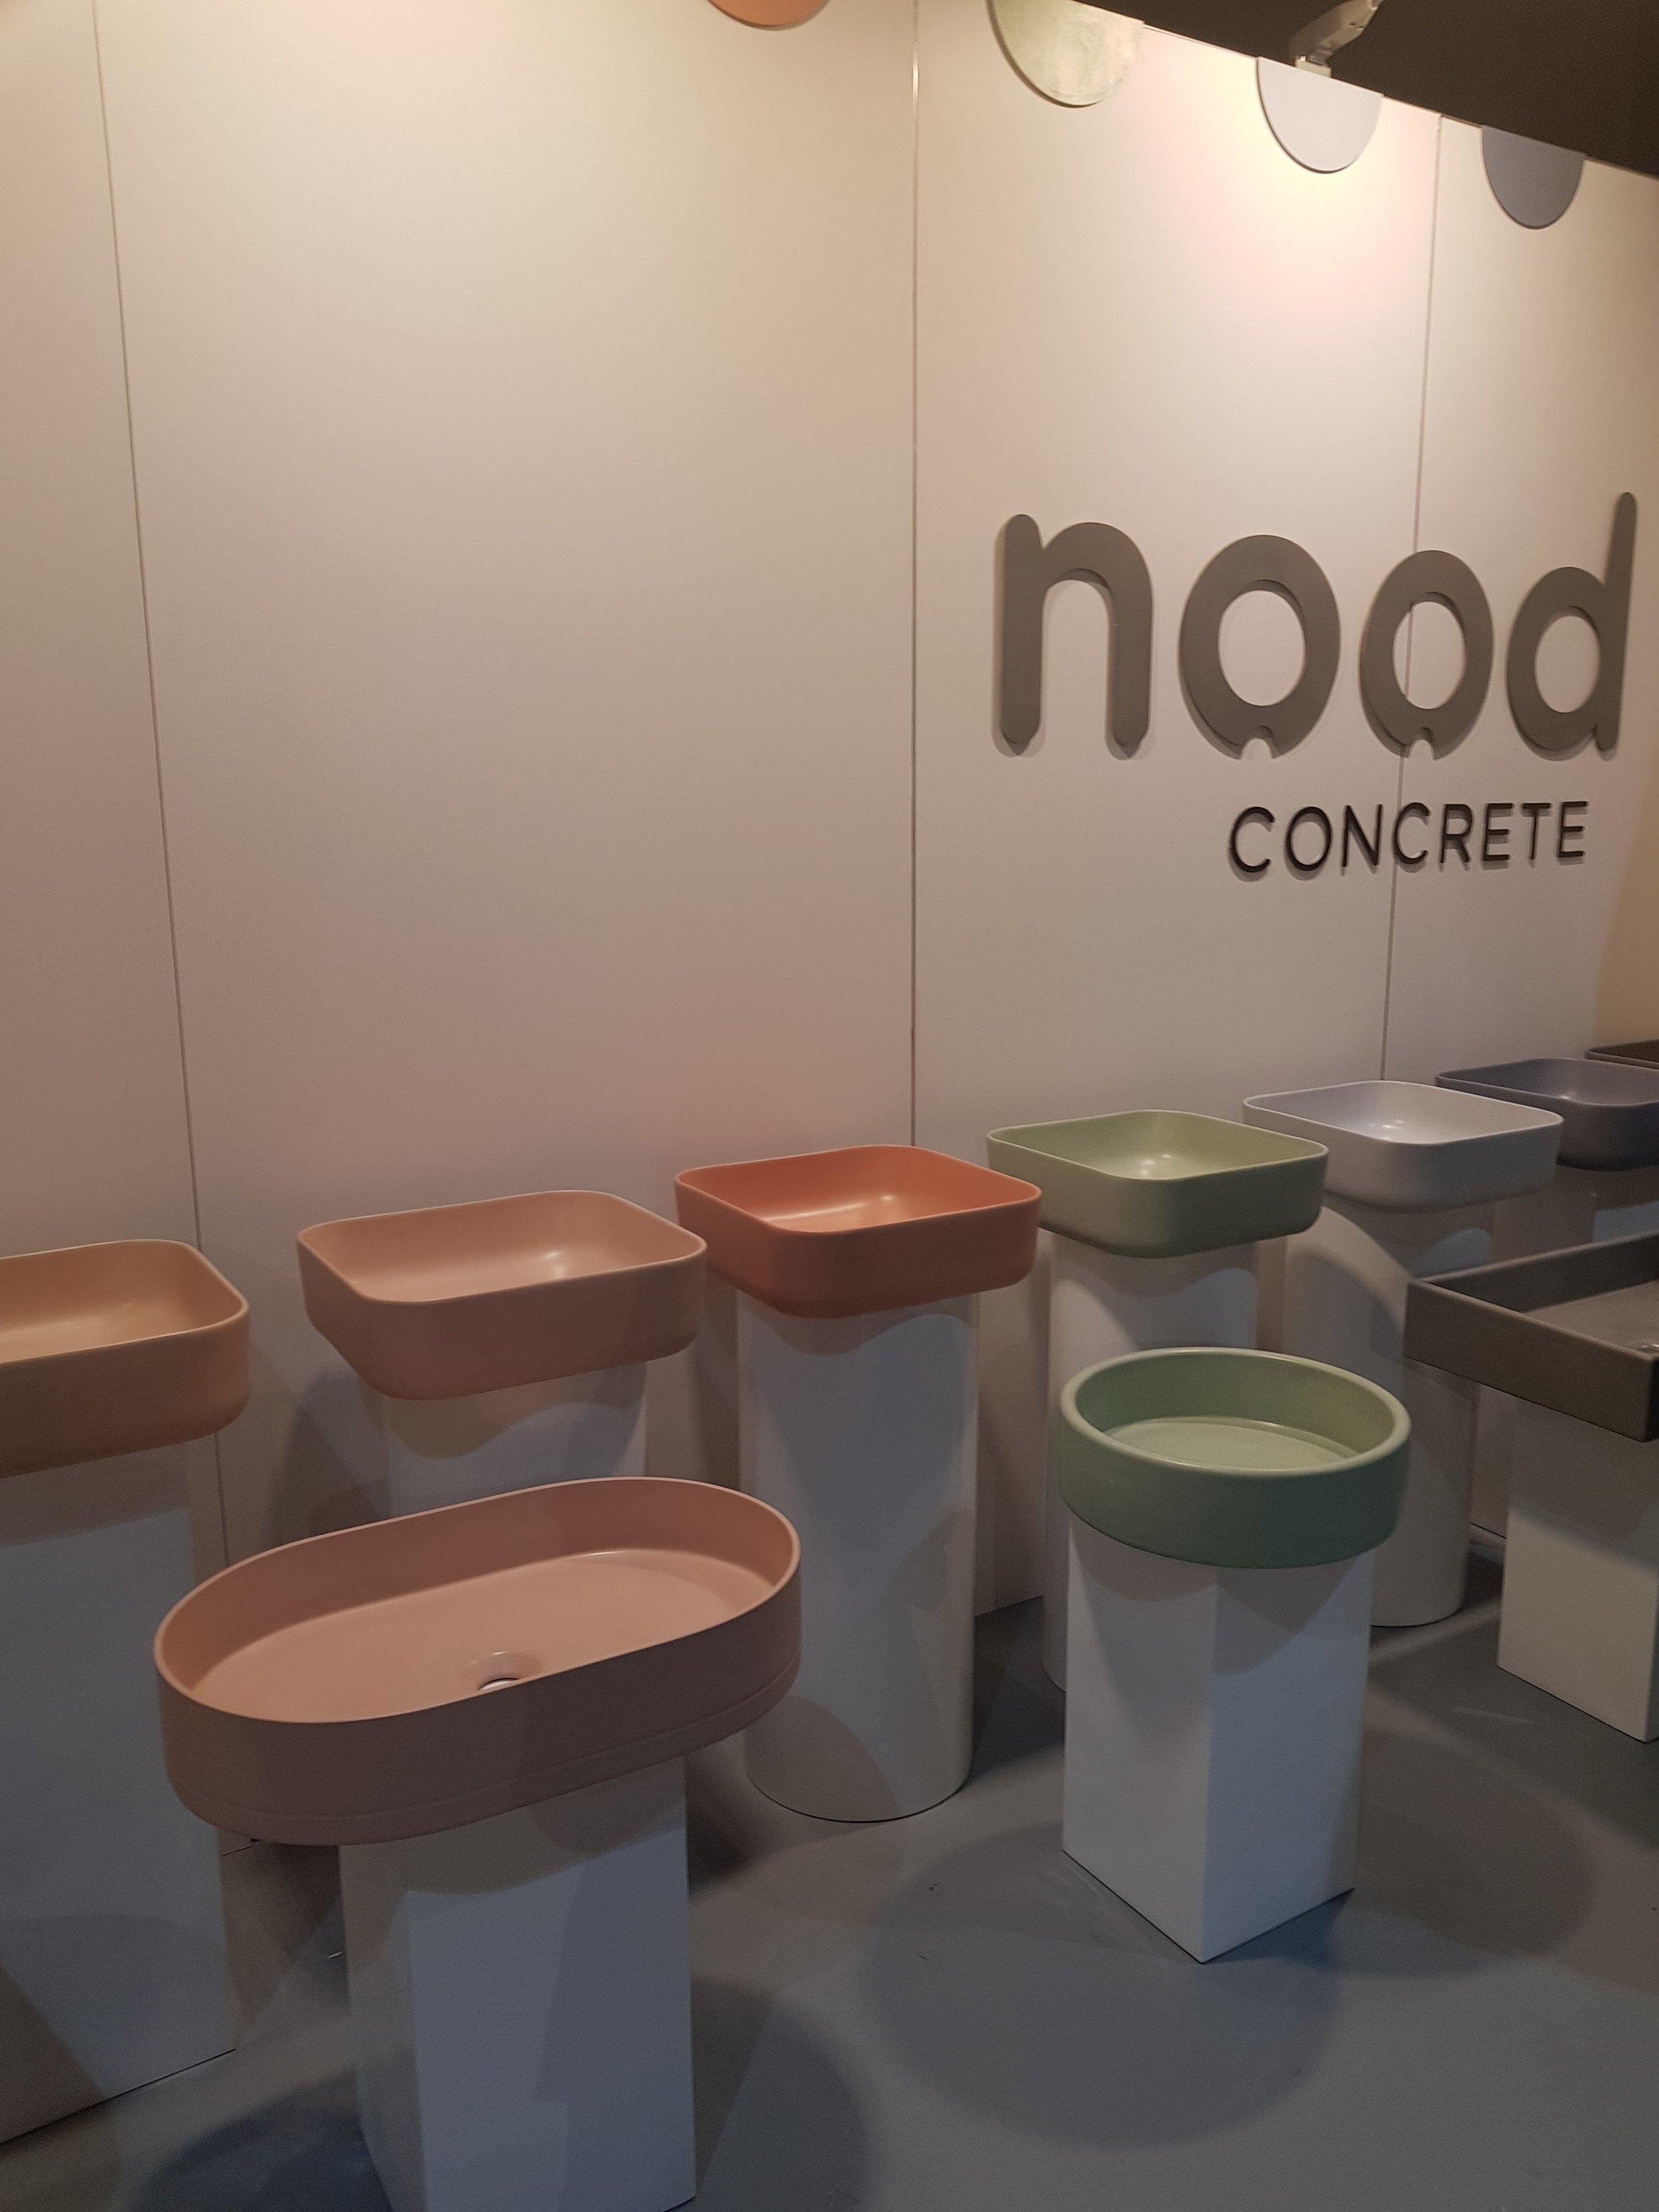 A rainbow of basins a Nood Concrete's stand!